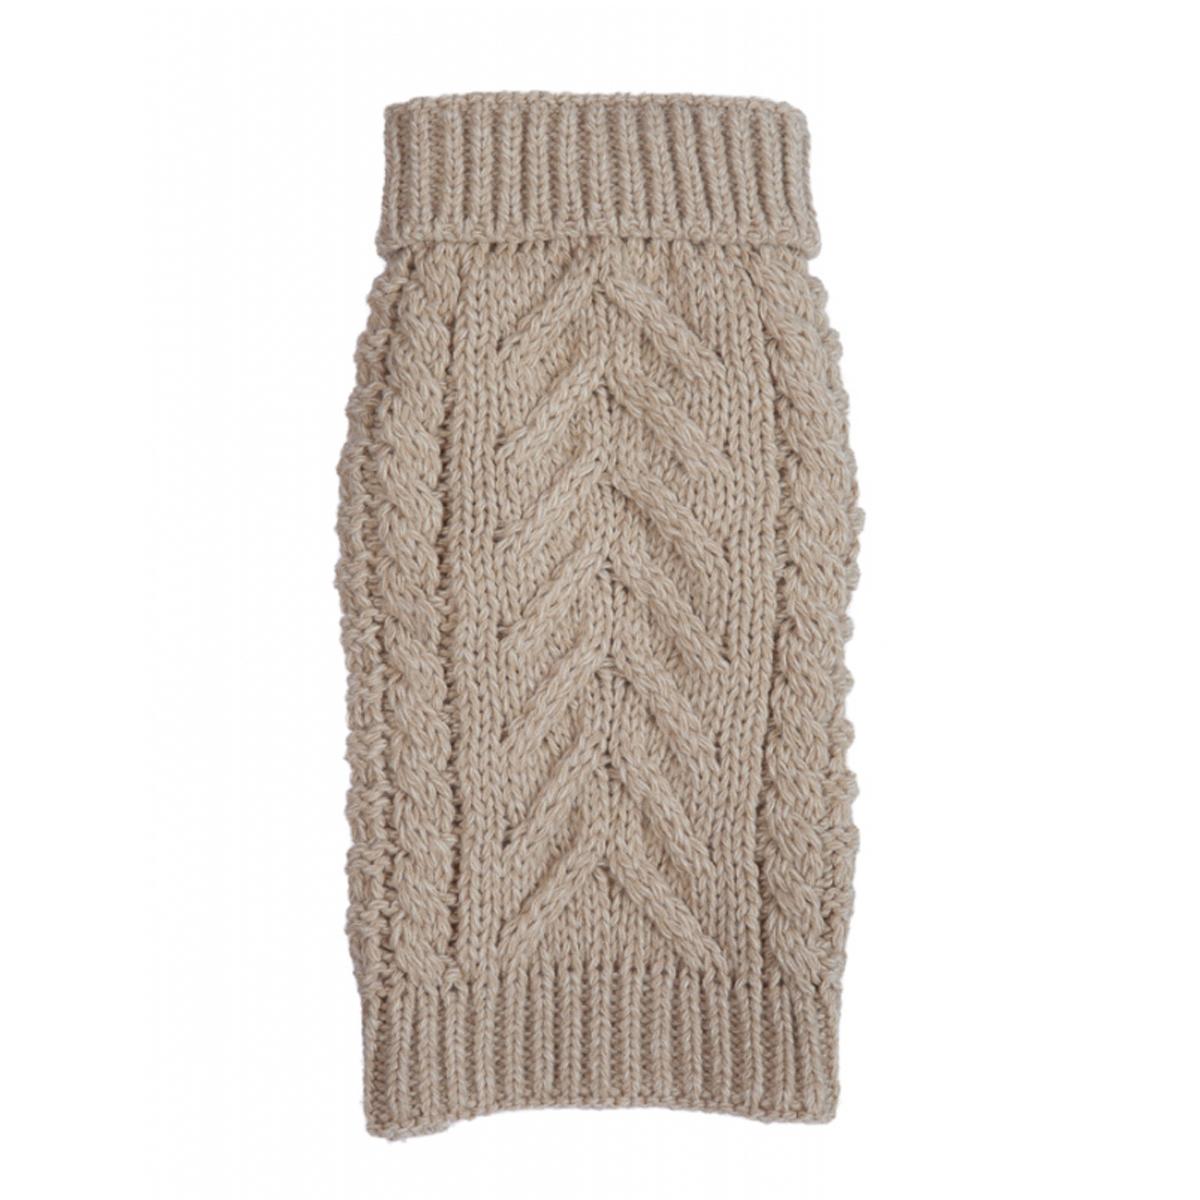 Chunky Turtleneck Dog Sweater - Oatmeal